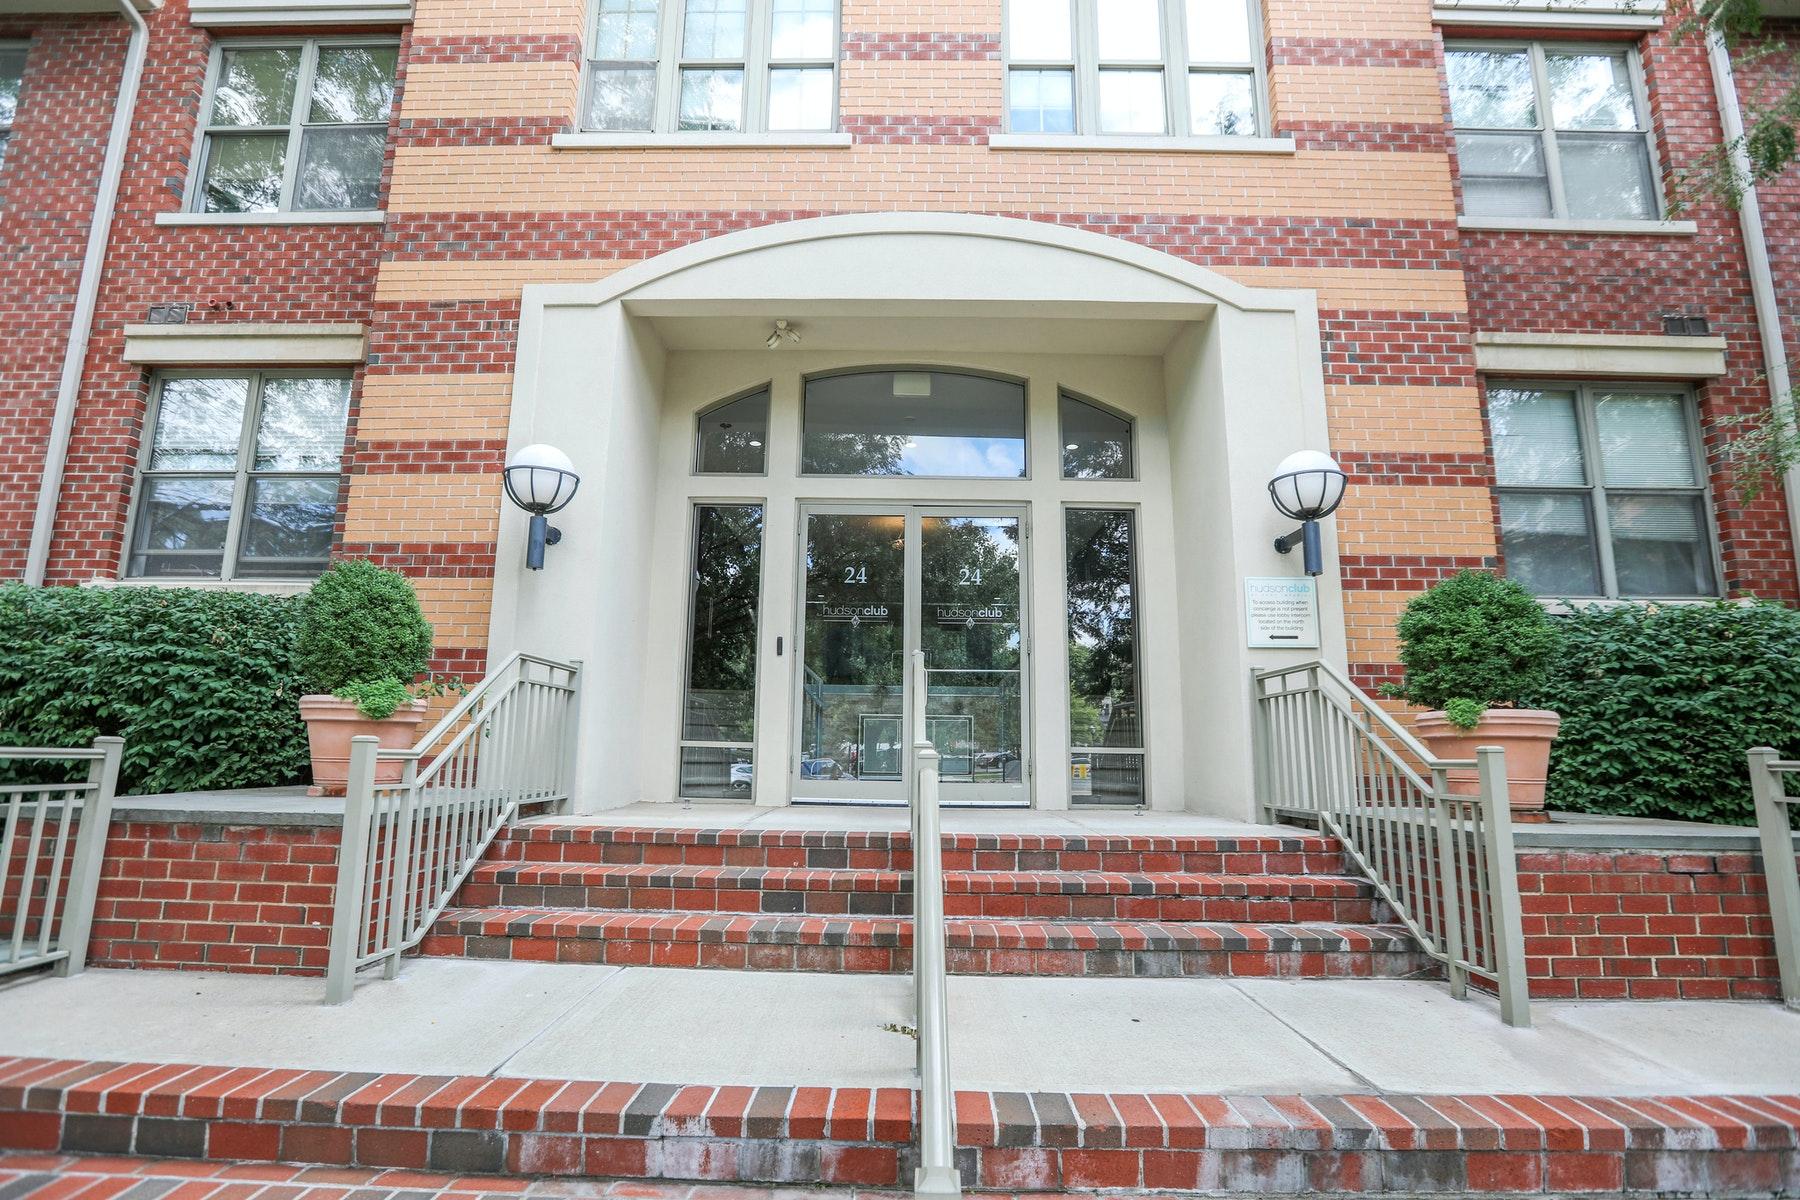 Condominiums 为 销售 在 Hudson Club 24 Avenue at Port Imperial #324, 西纽约, 新泽西州 07093 美国